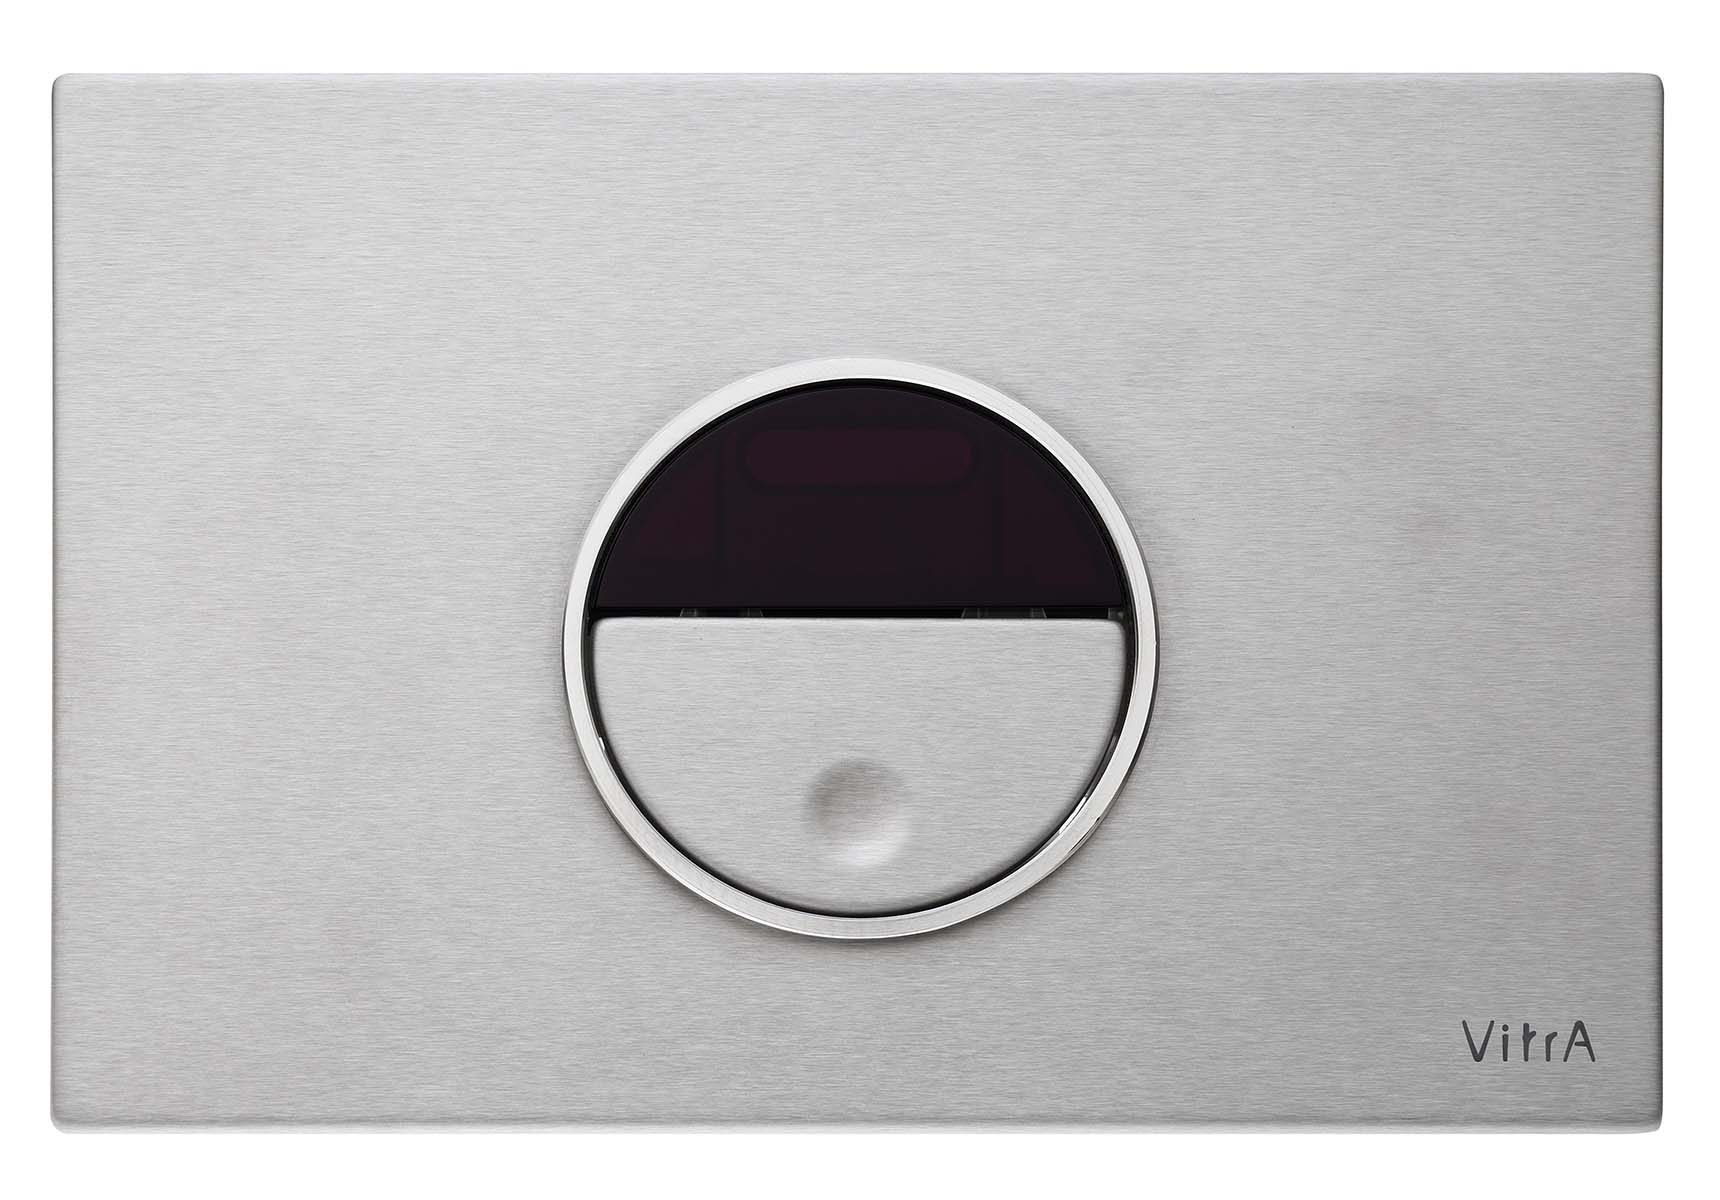 VitrA Pro Photocelled Control Panel - Shinny Chrome